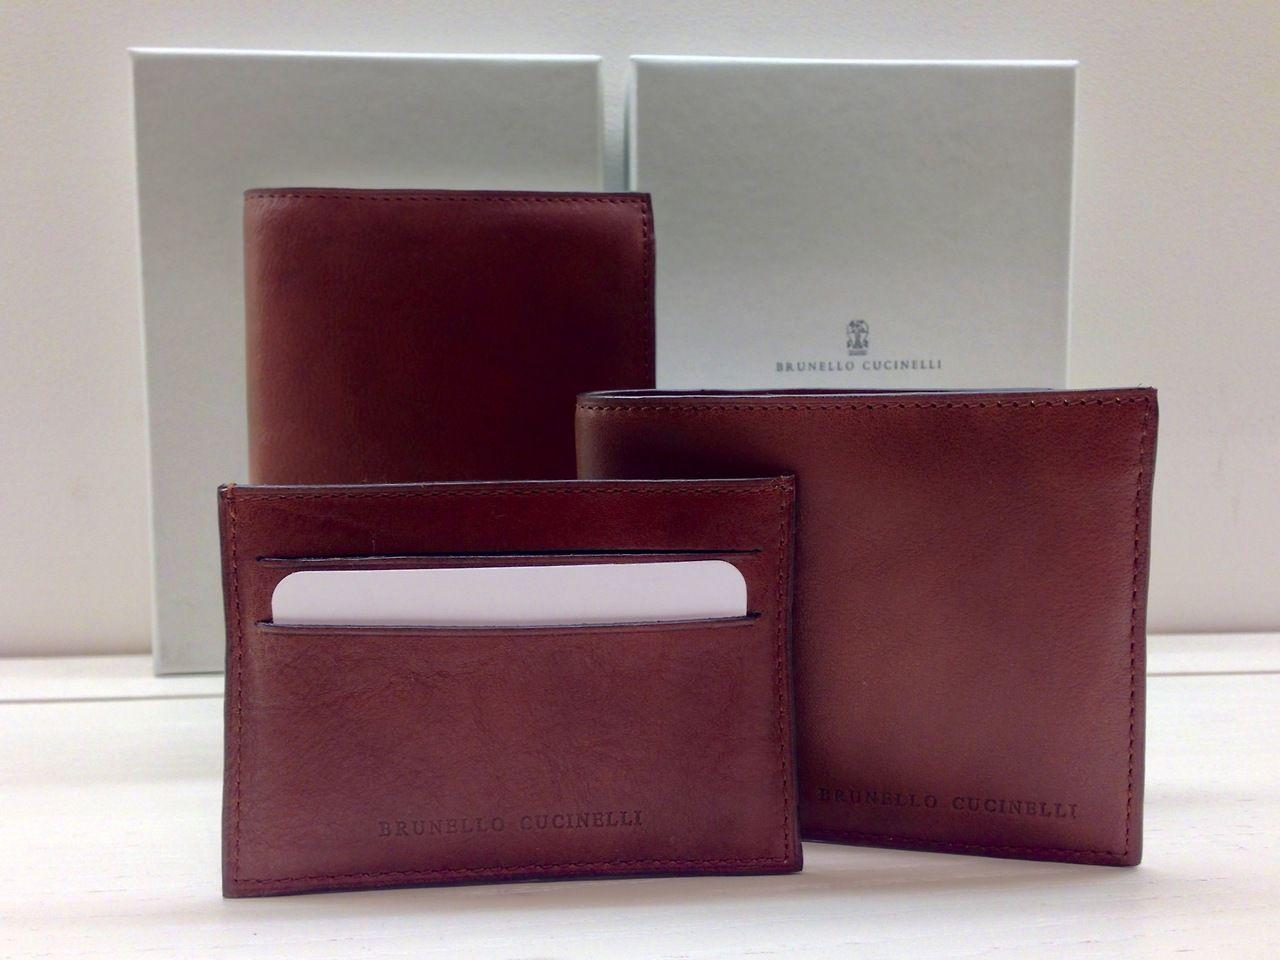 Small Leather Goods - Wallets Brunello Cucinelli PqByjZFO